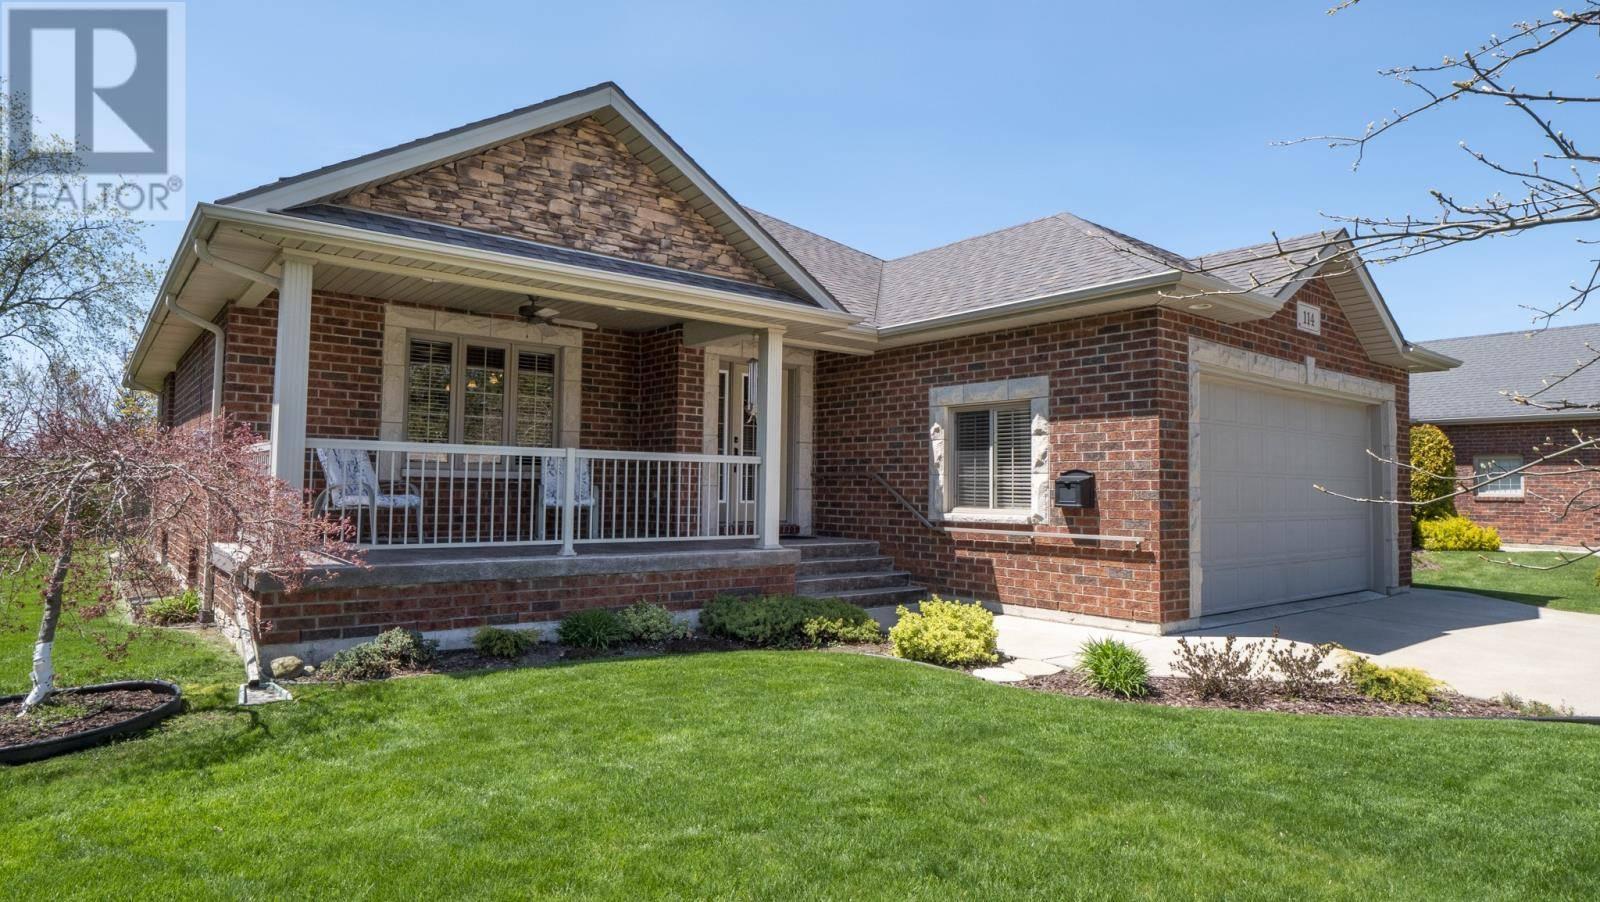 House for sale at 114 Prince Albert Street North  Kingsville Ontario - MLS: 20005028